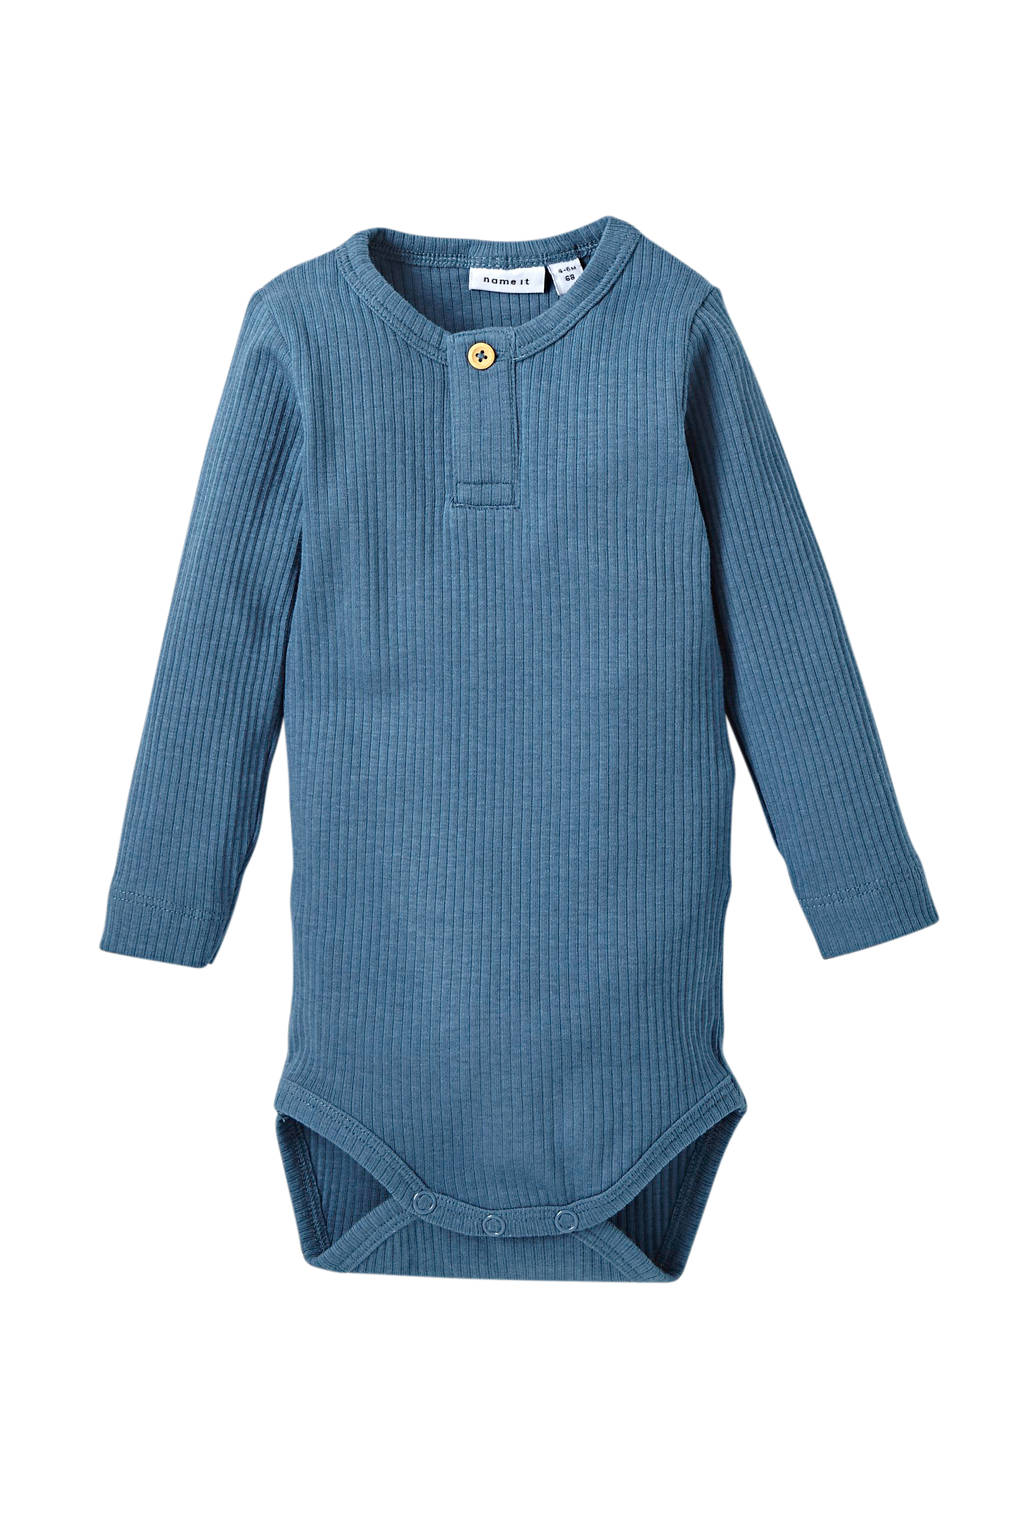 NAME IT BABY newborn baby romper Kabille blauw, Blauw